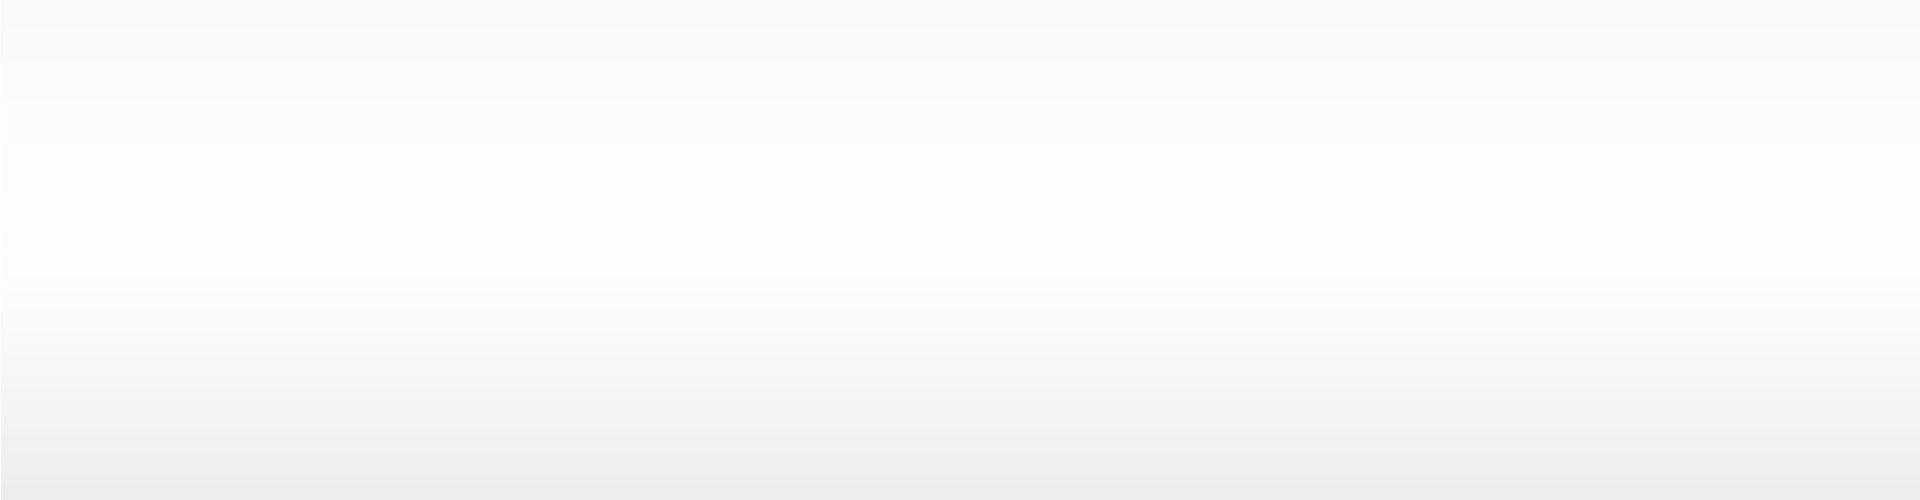 gran_moravia-homepage-forza-BG